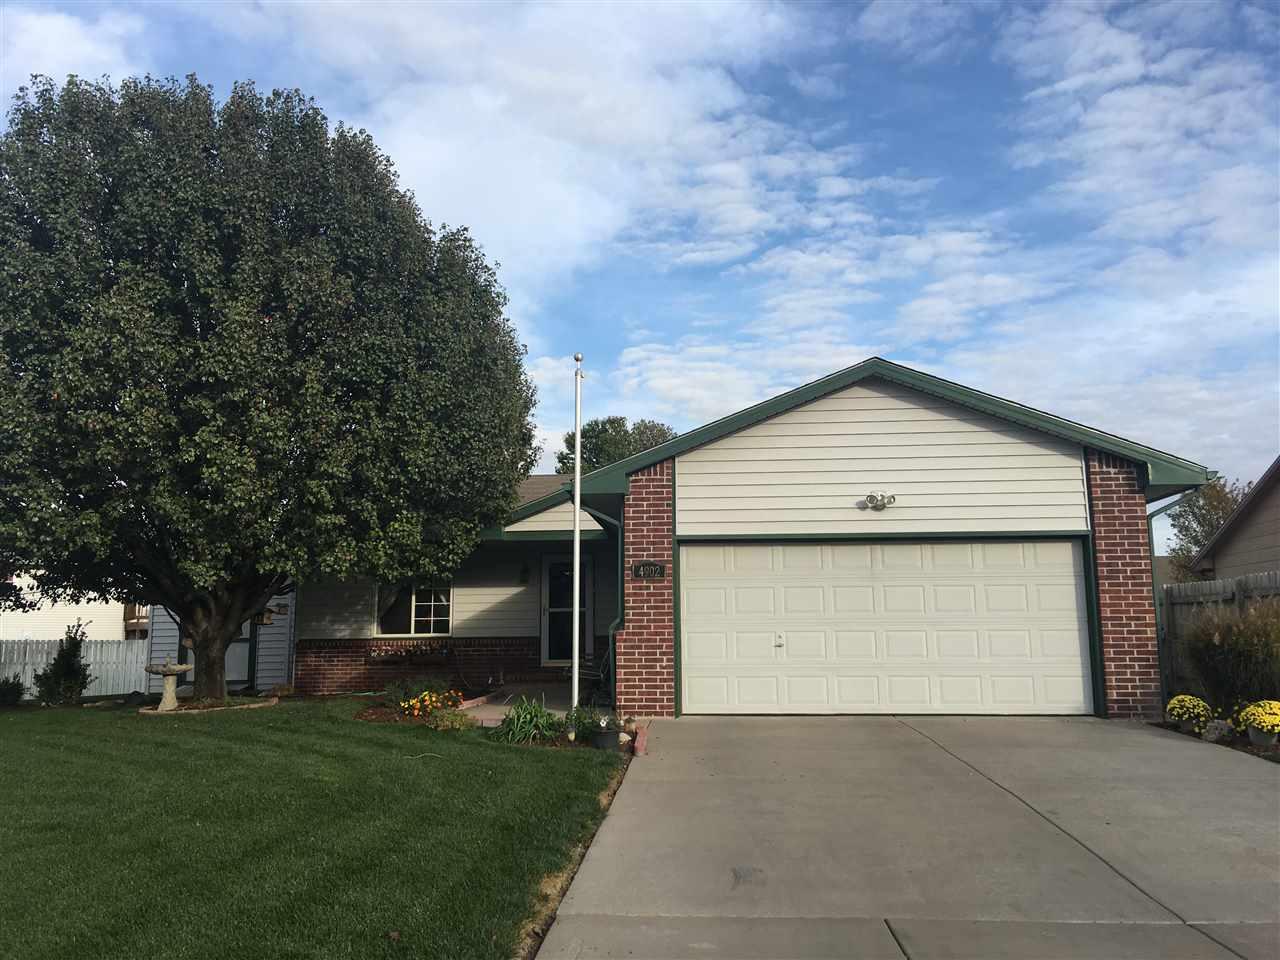 4902 S Mount Carmel Ave, Wichita, KS 67217